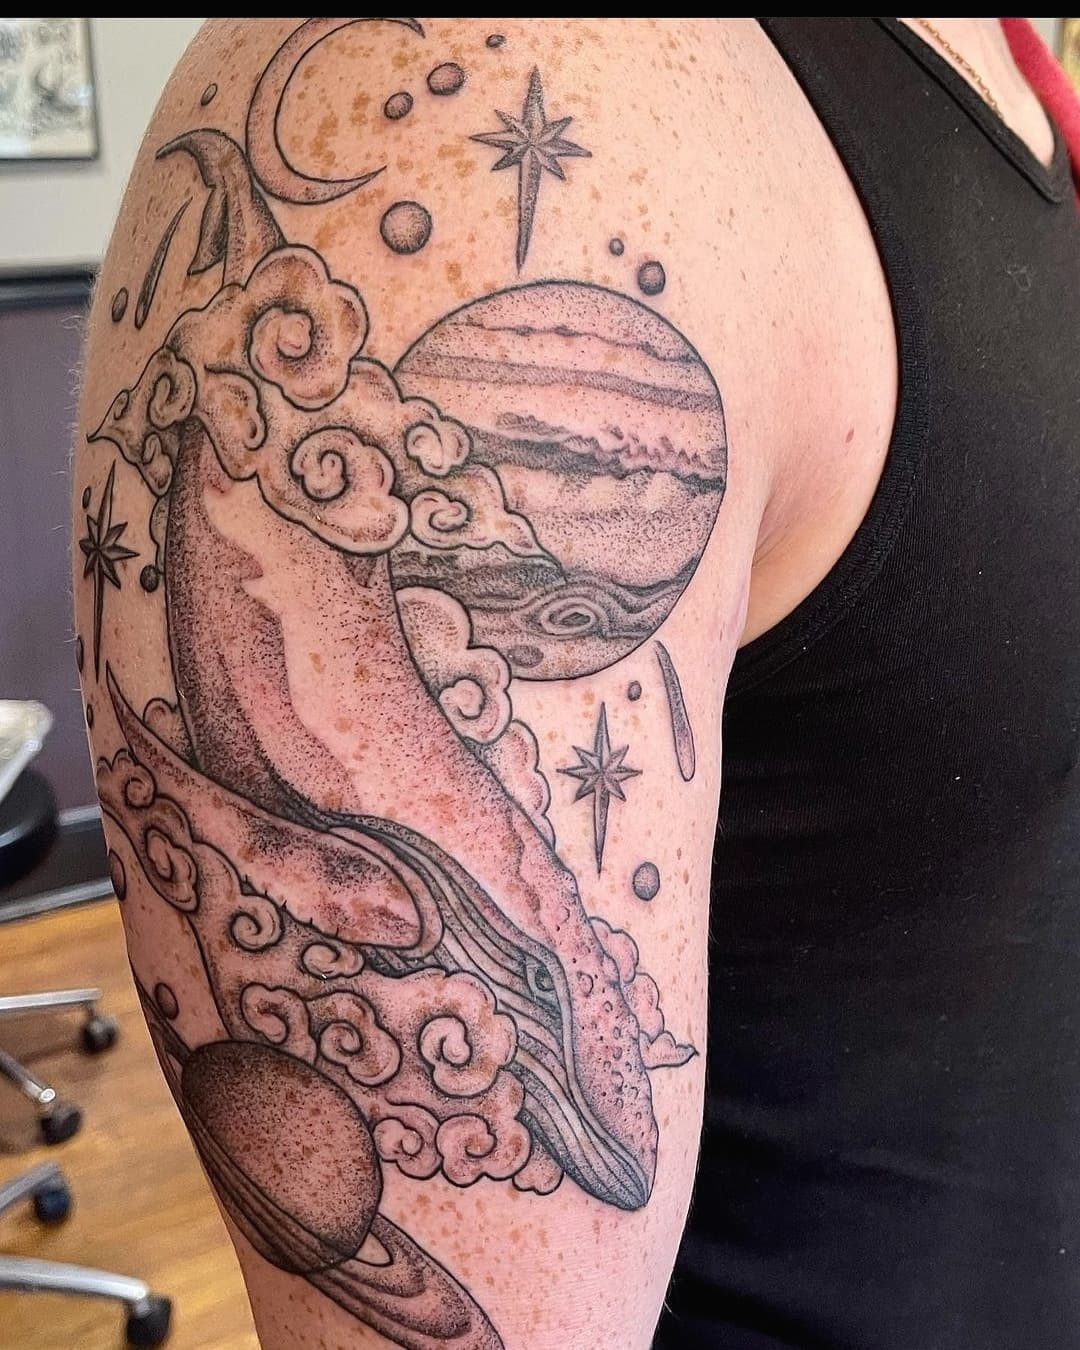 Space whale by Chico Lou's Fine tattoos studio in AthensGeorgia GA. Artist - Jess Clark